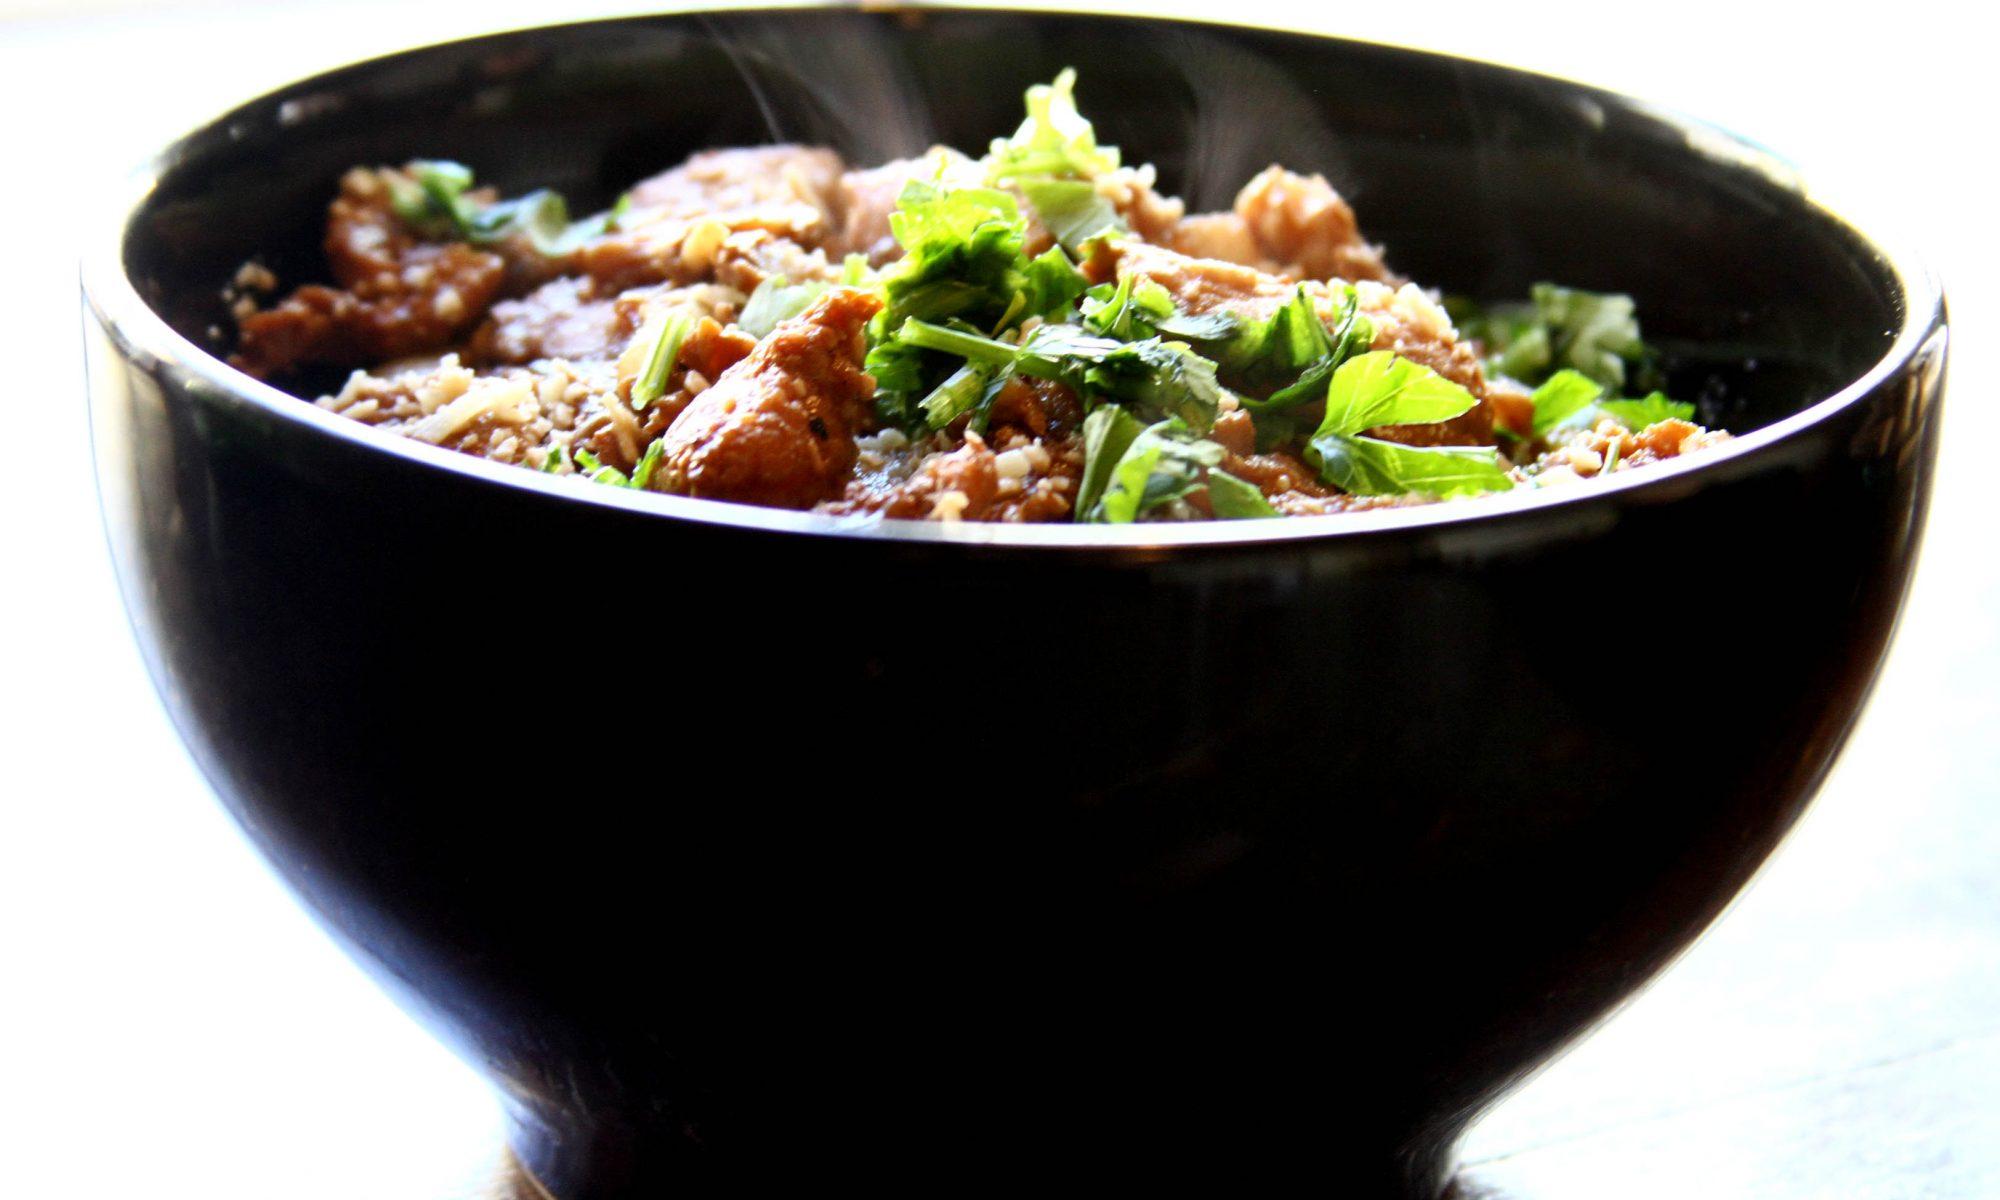 Mr. Chau Yakisoba & Noodles